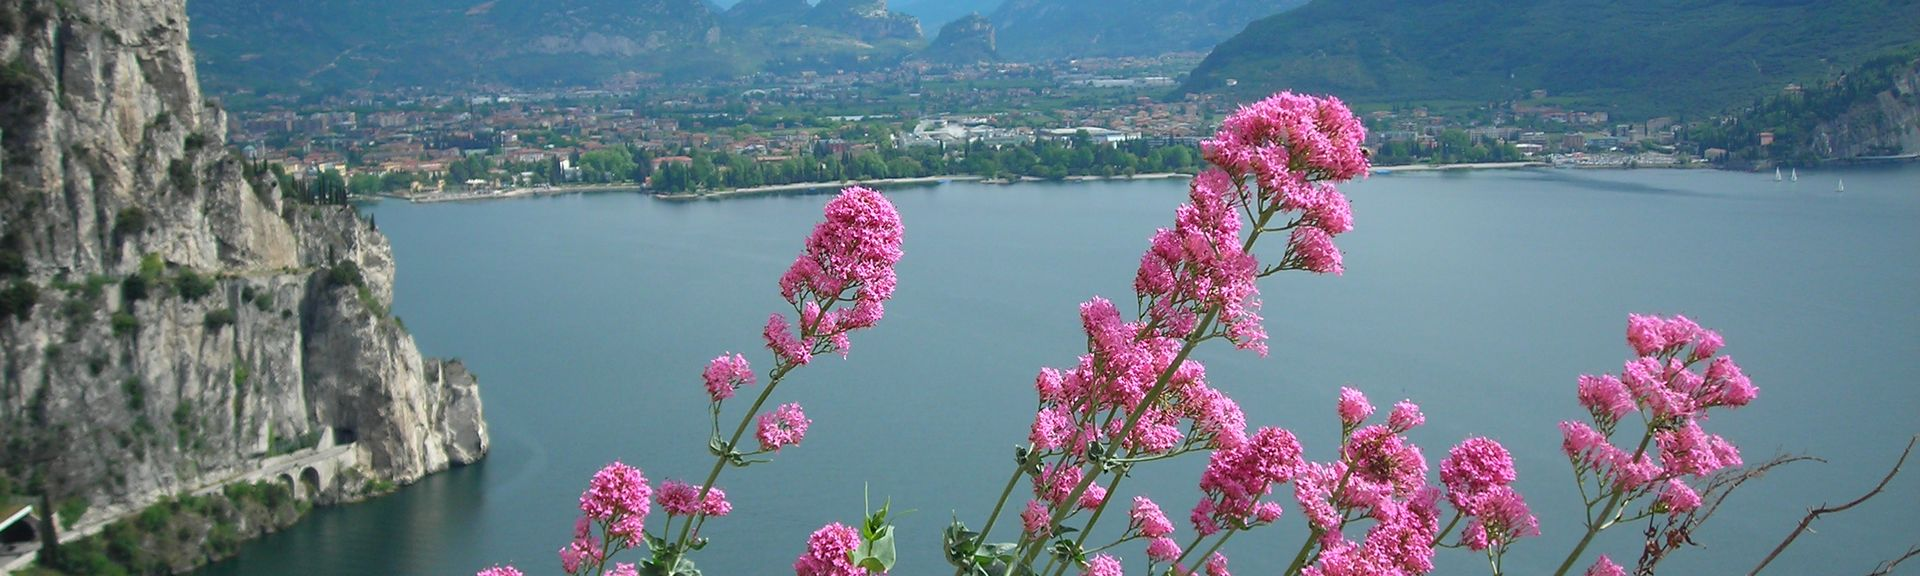 Nomi, Trentino-Alto Adige, Italia